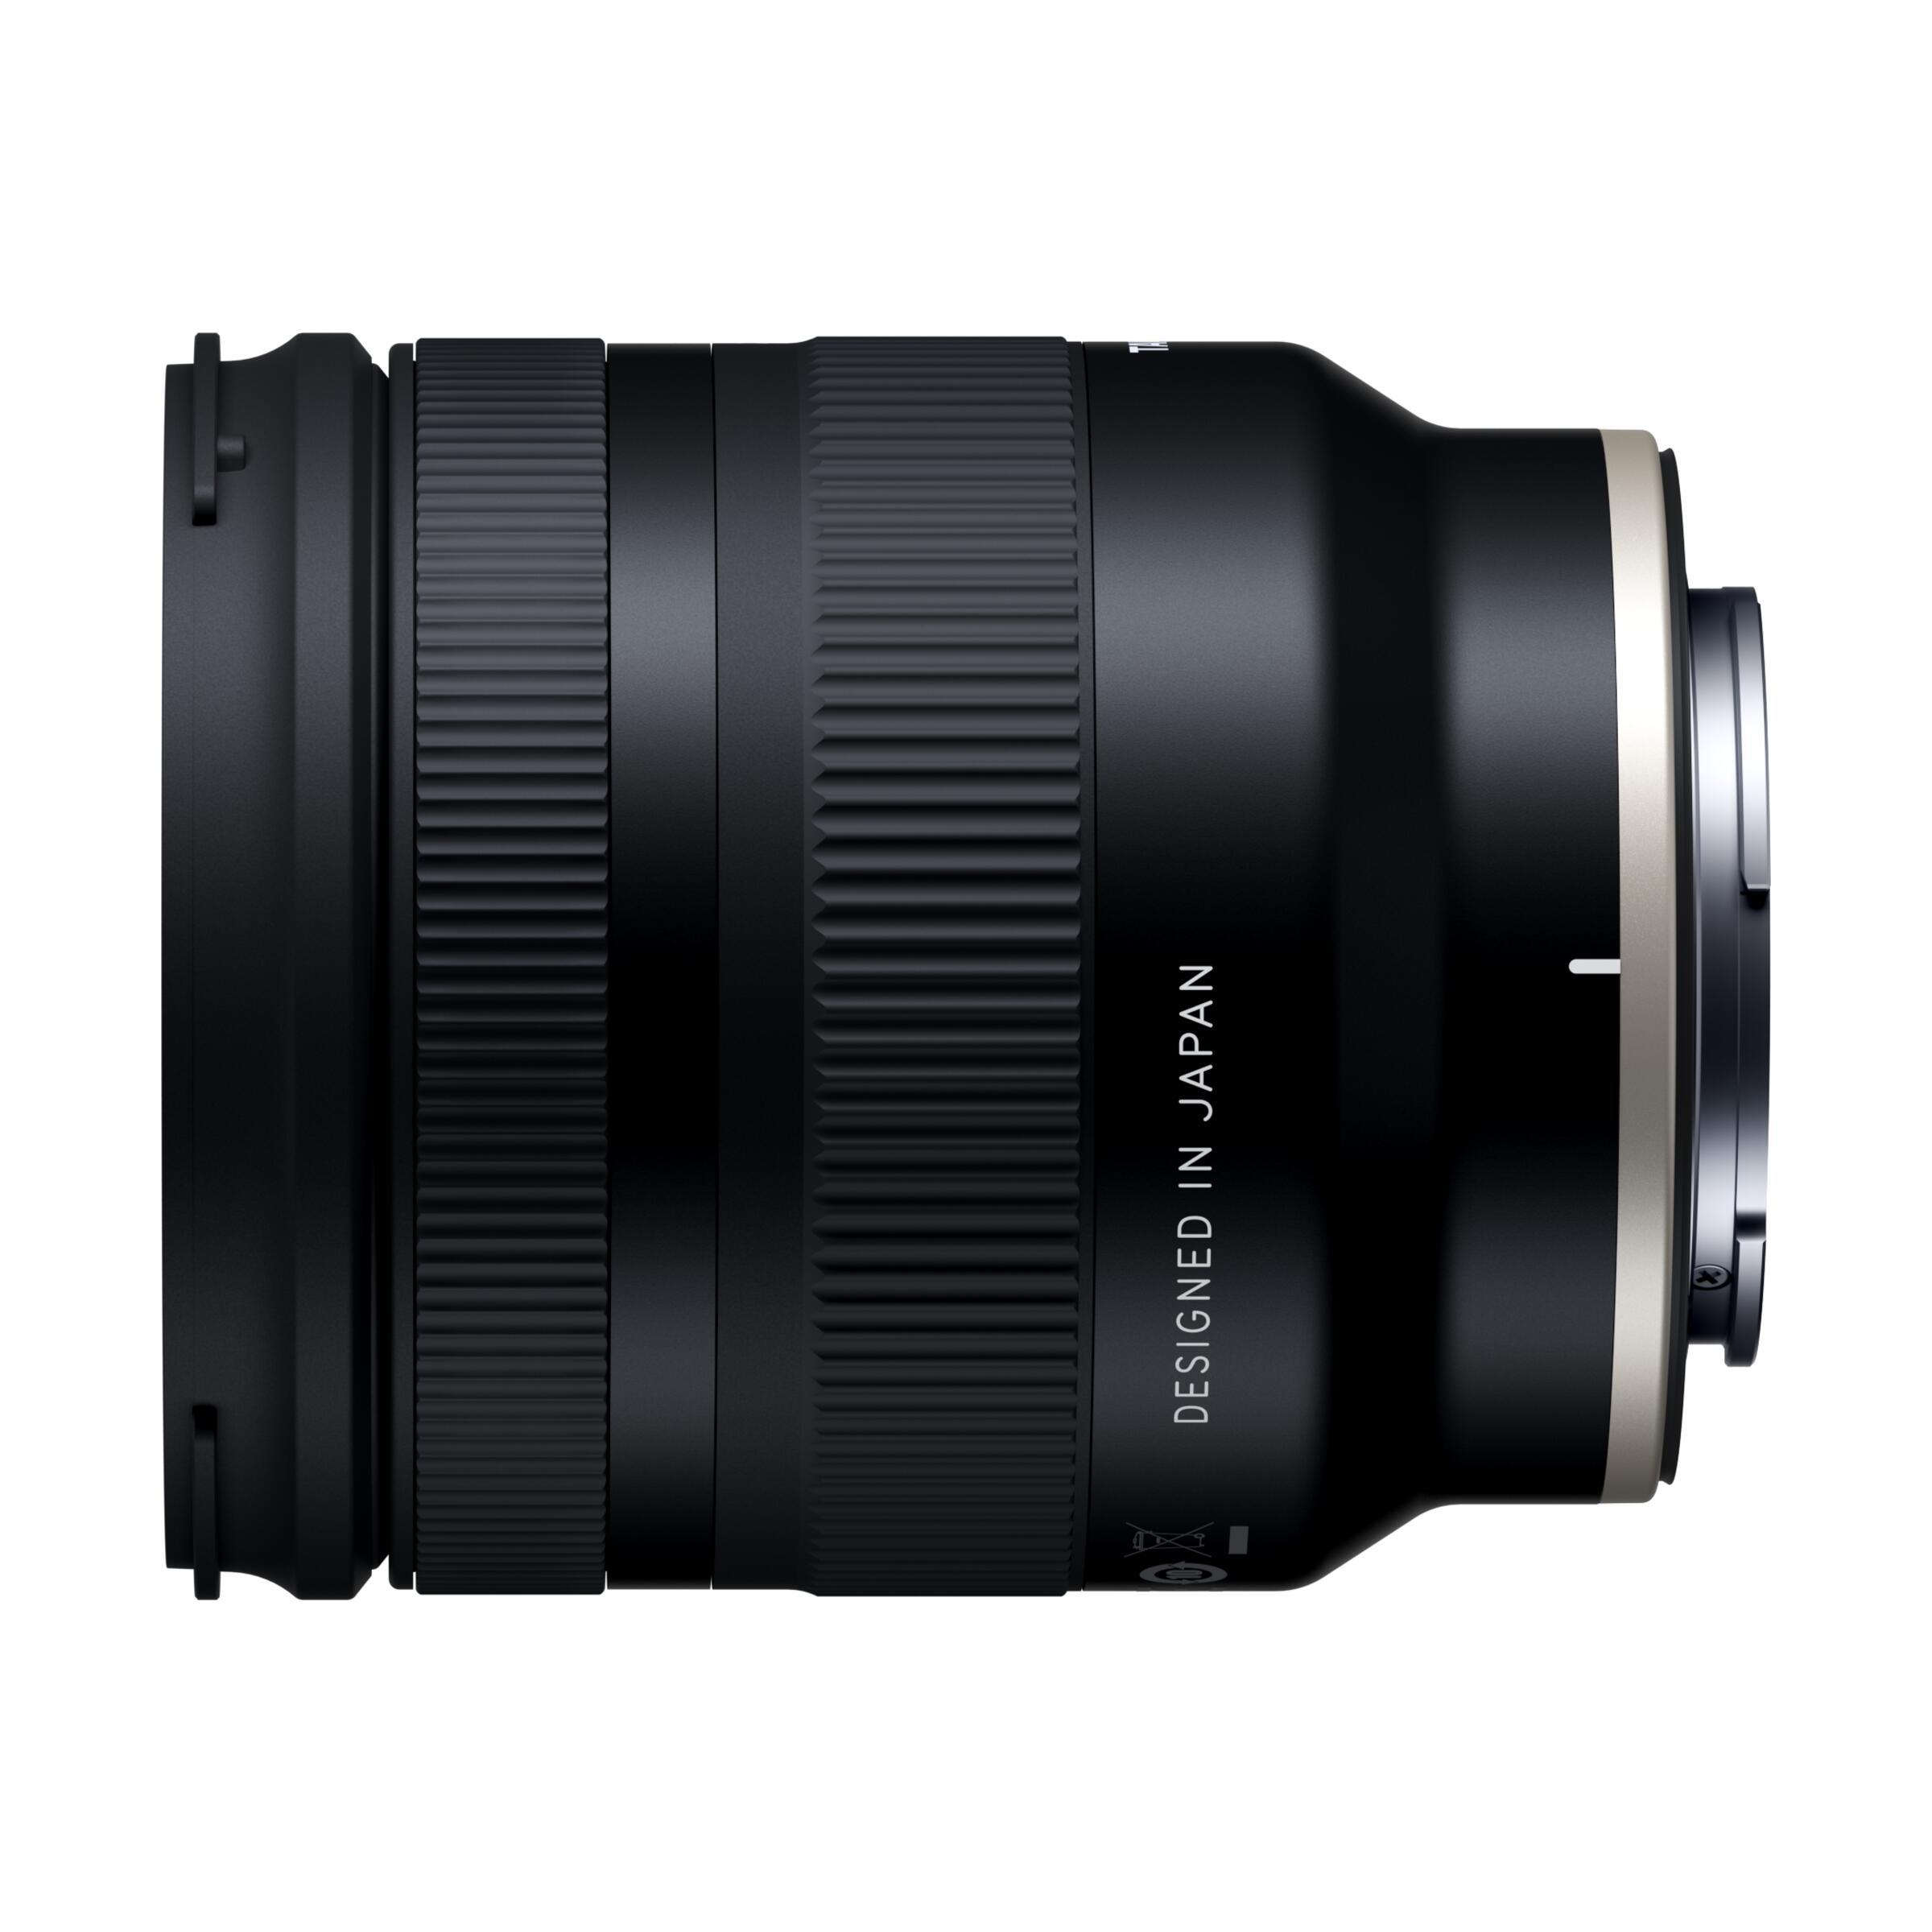 Tamron 11-20mm f/2,8 Di III-A RXD für Sony E